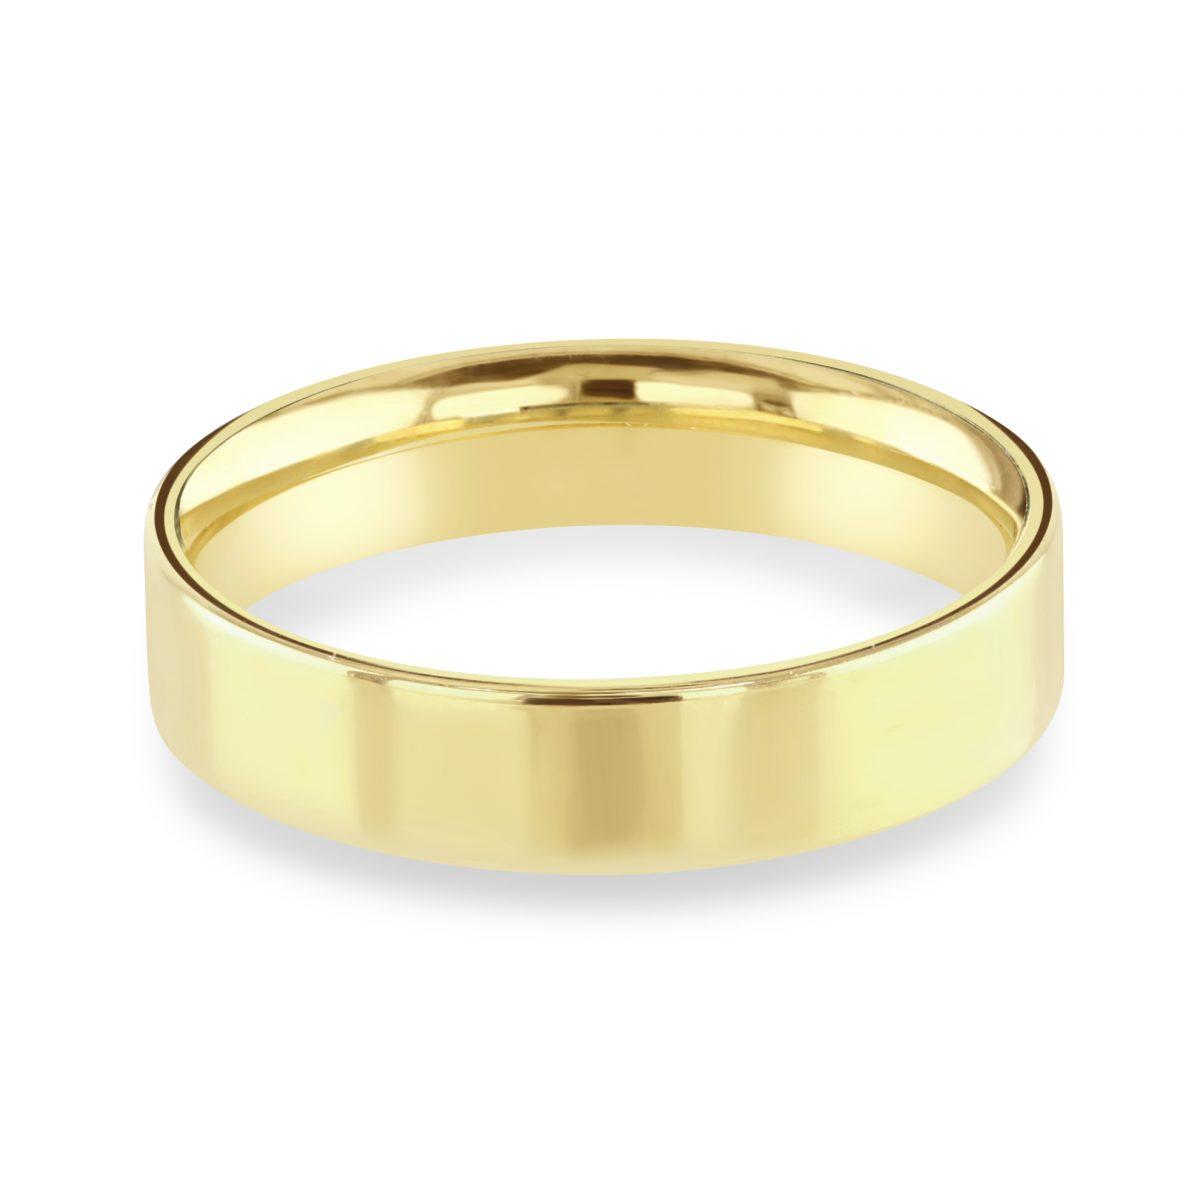 wedding-bands/23-50-121.jpg;;wedding-bands/23-50-121 - flip.jpg